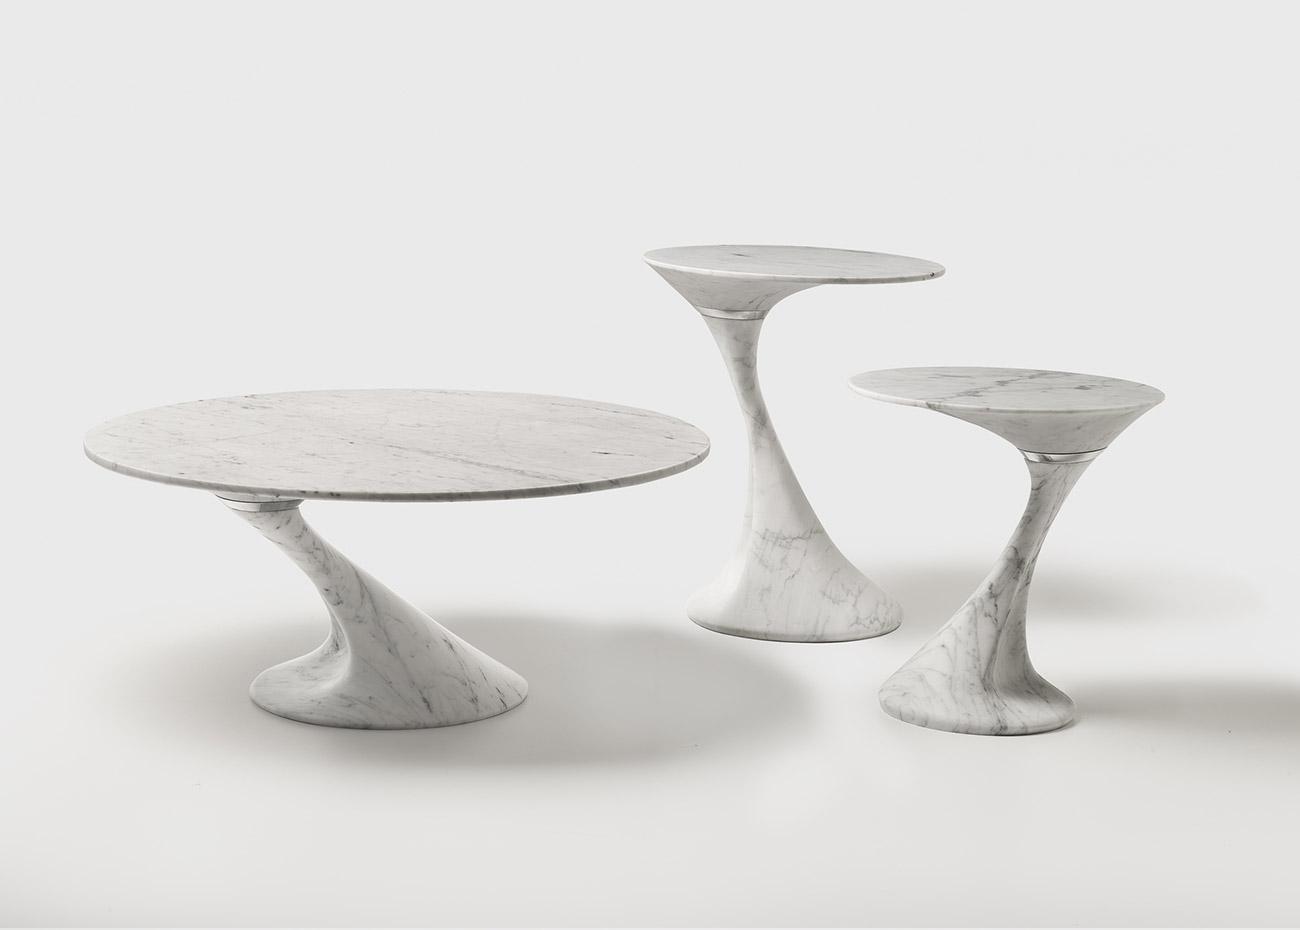 swan-tavoli-maarmo-design-collection